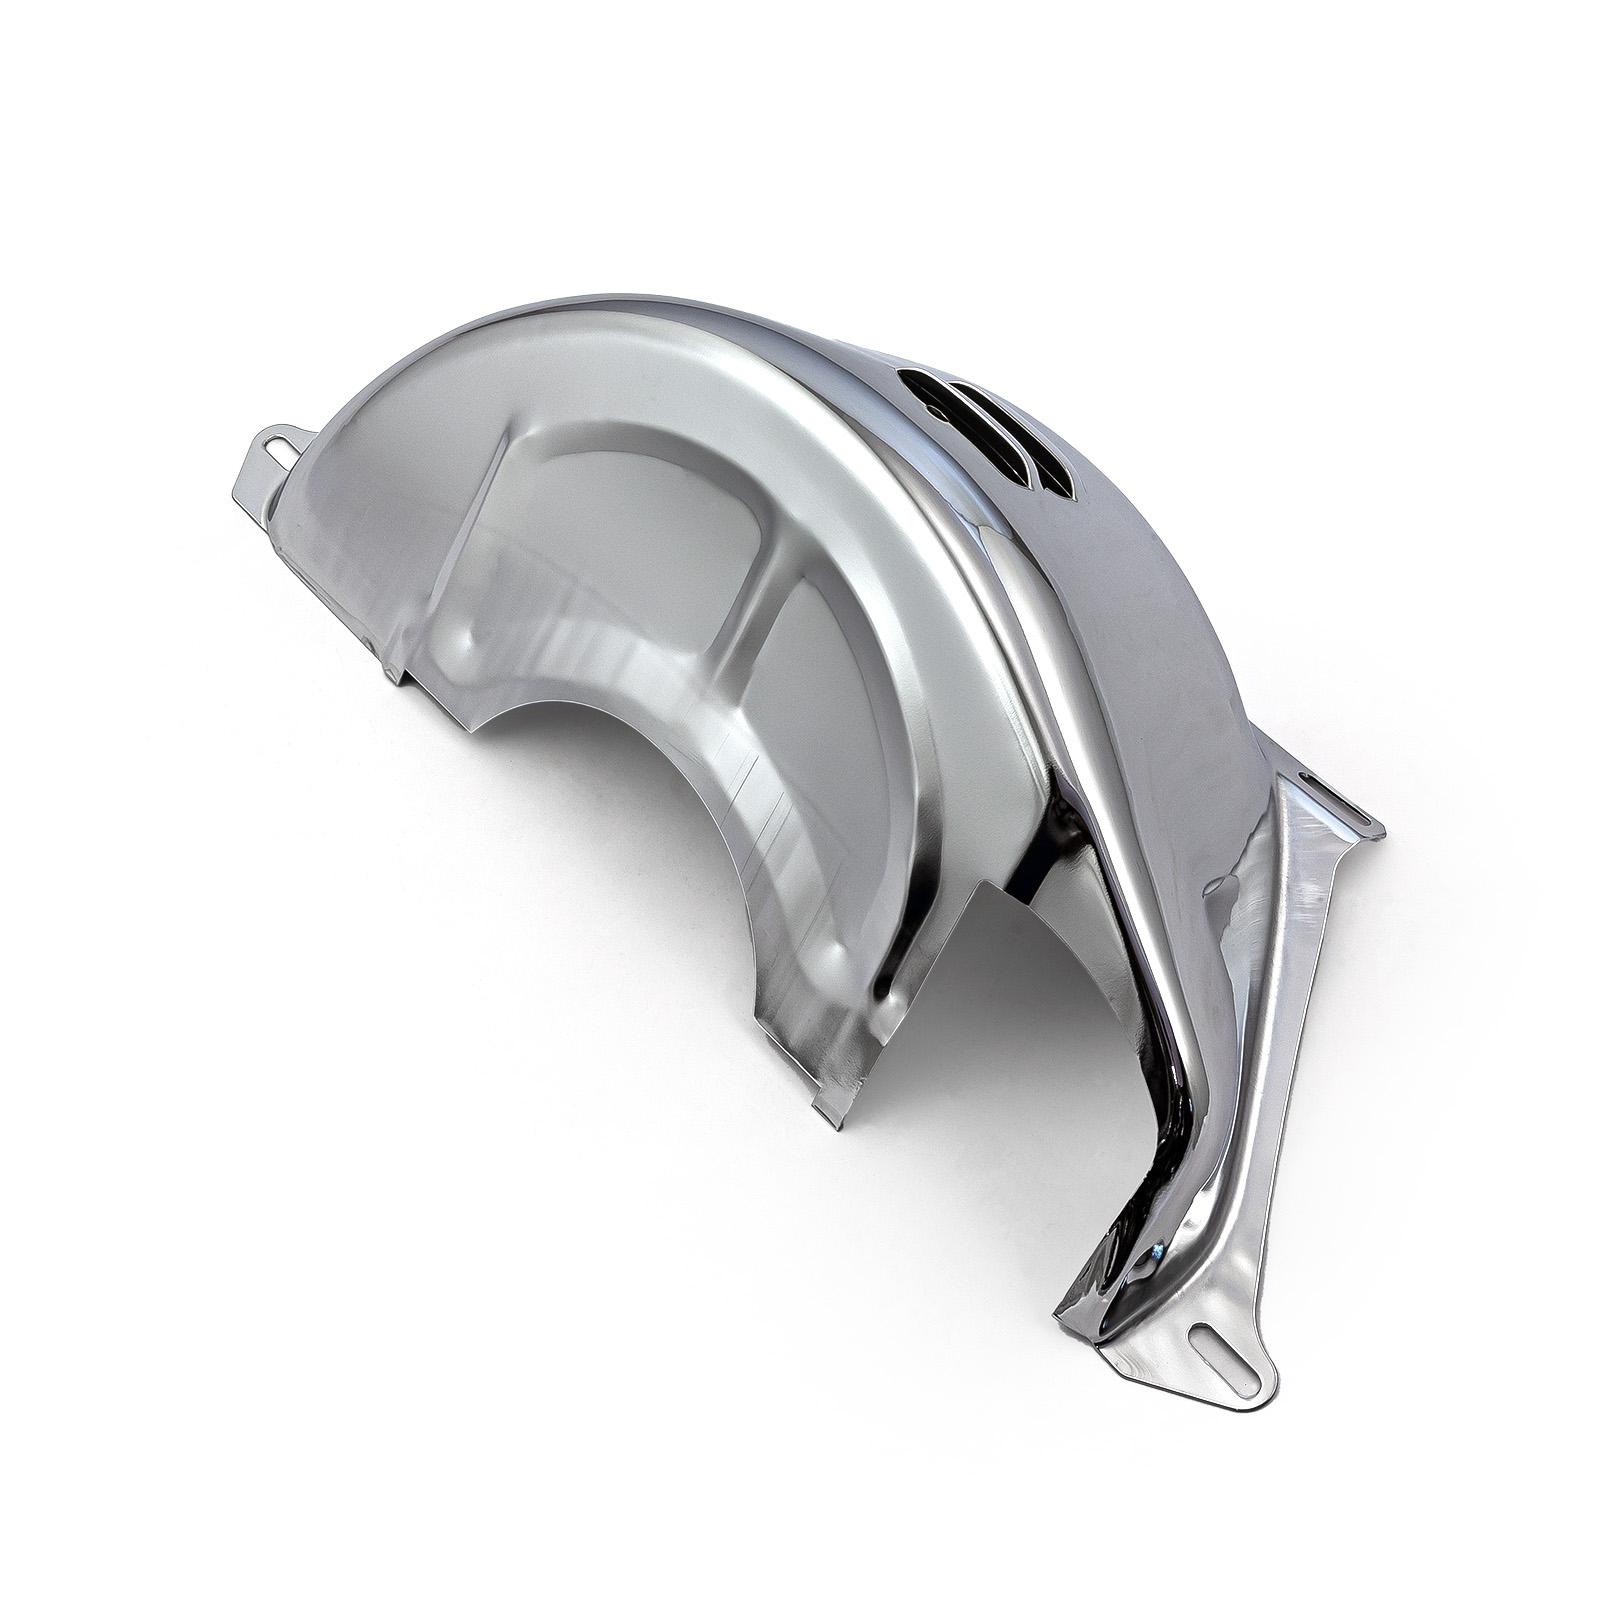 "PCE® PCE227.1003 Chevy Gm Turbo Th350 400 Flywheel Dust Cover Chrome (2 7/8"" Starter Slot)"